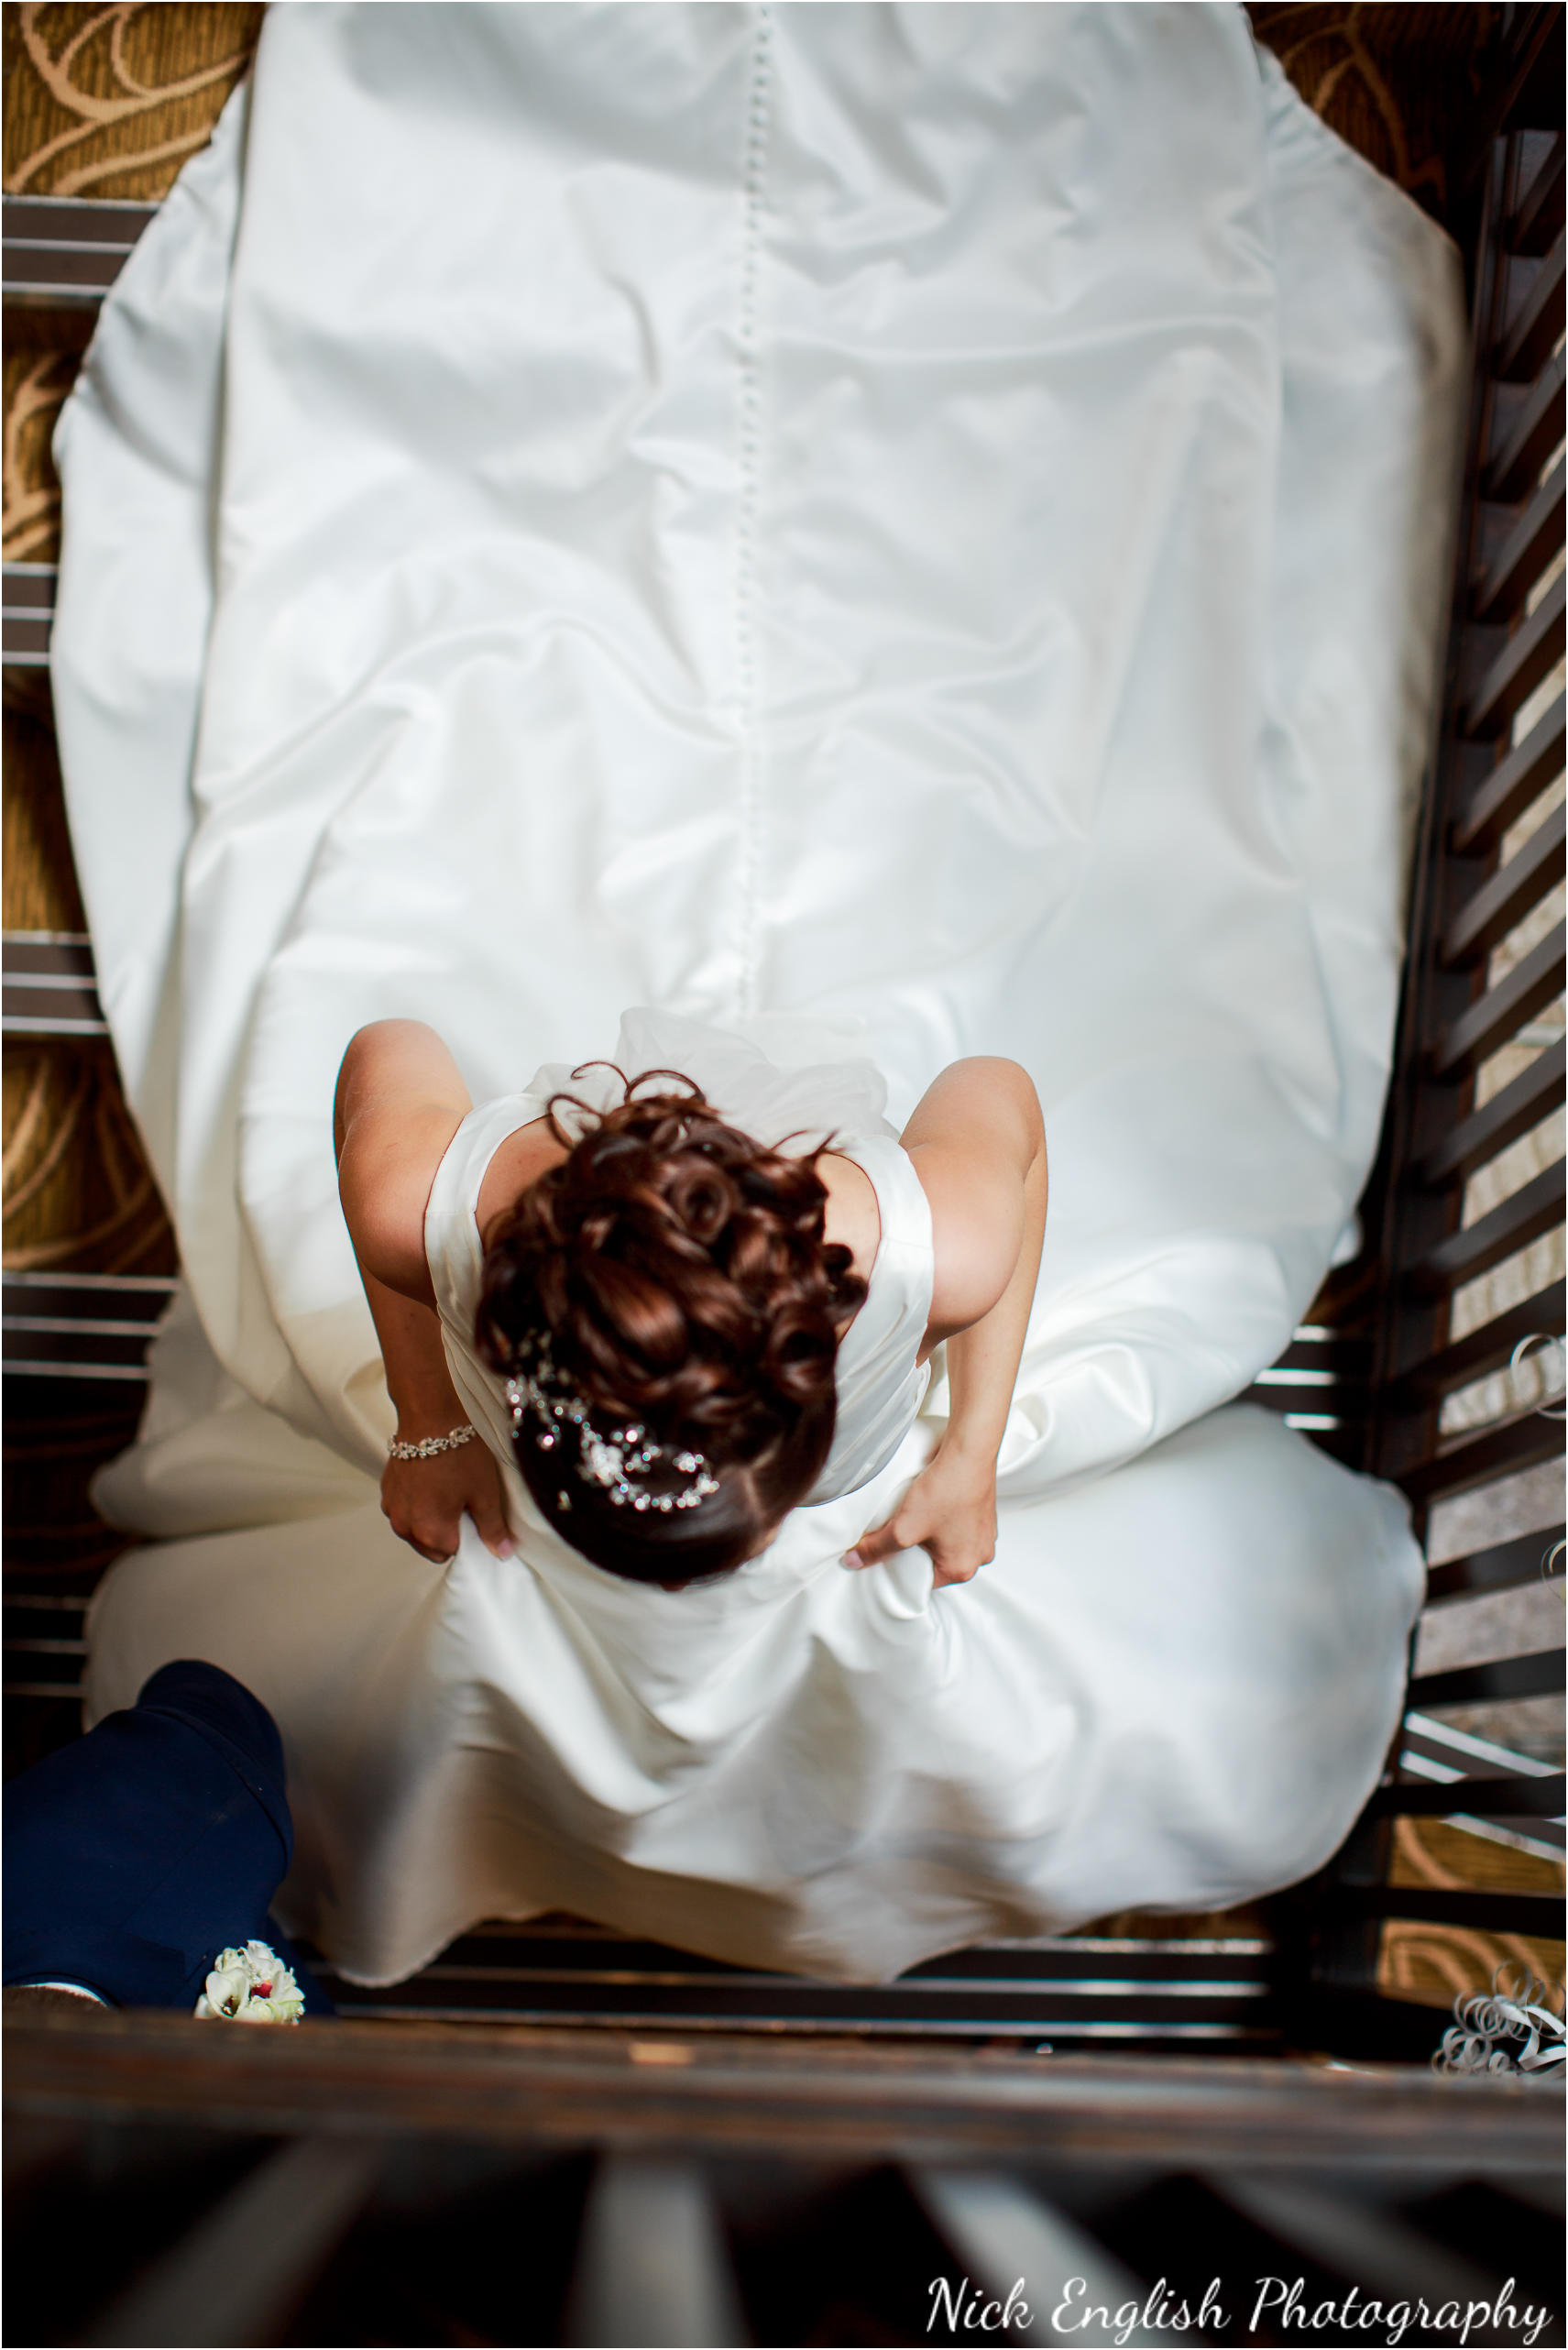 Emily David Wedding Photographs at Barton Grange Preston by Nick English Photography 156jpg.jpeg